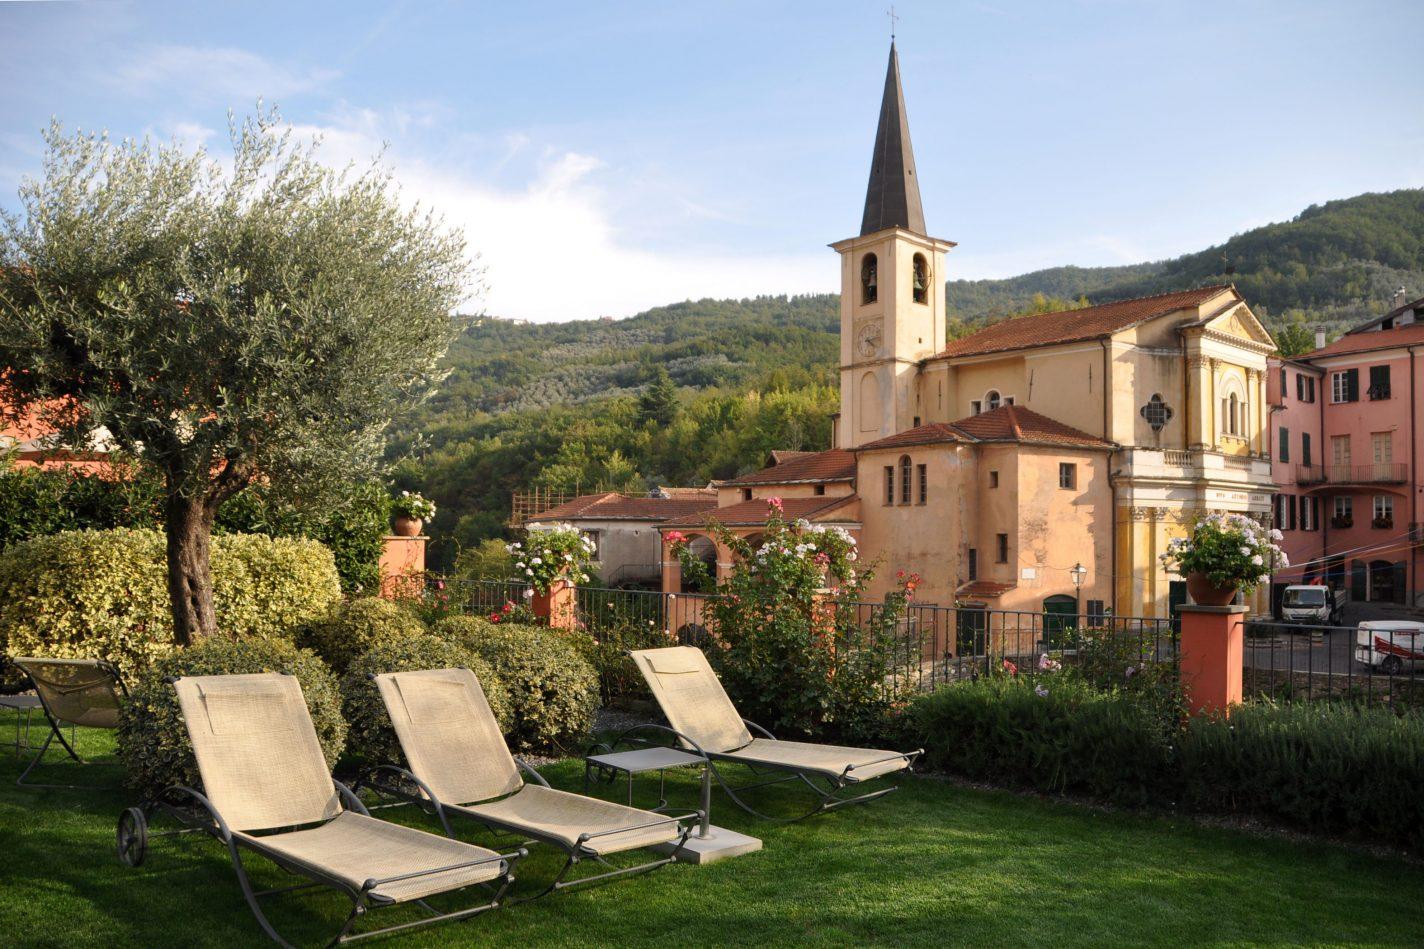 Onbeperkt eten in Borgomaro – Liguria, Italië